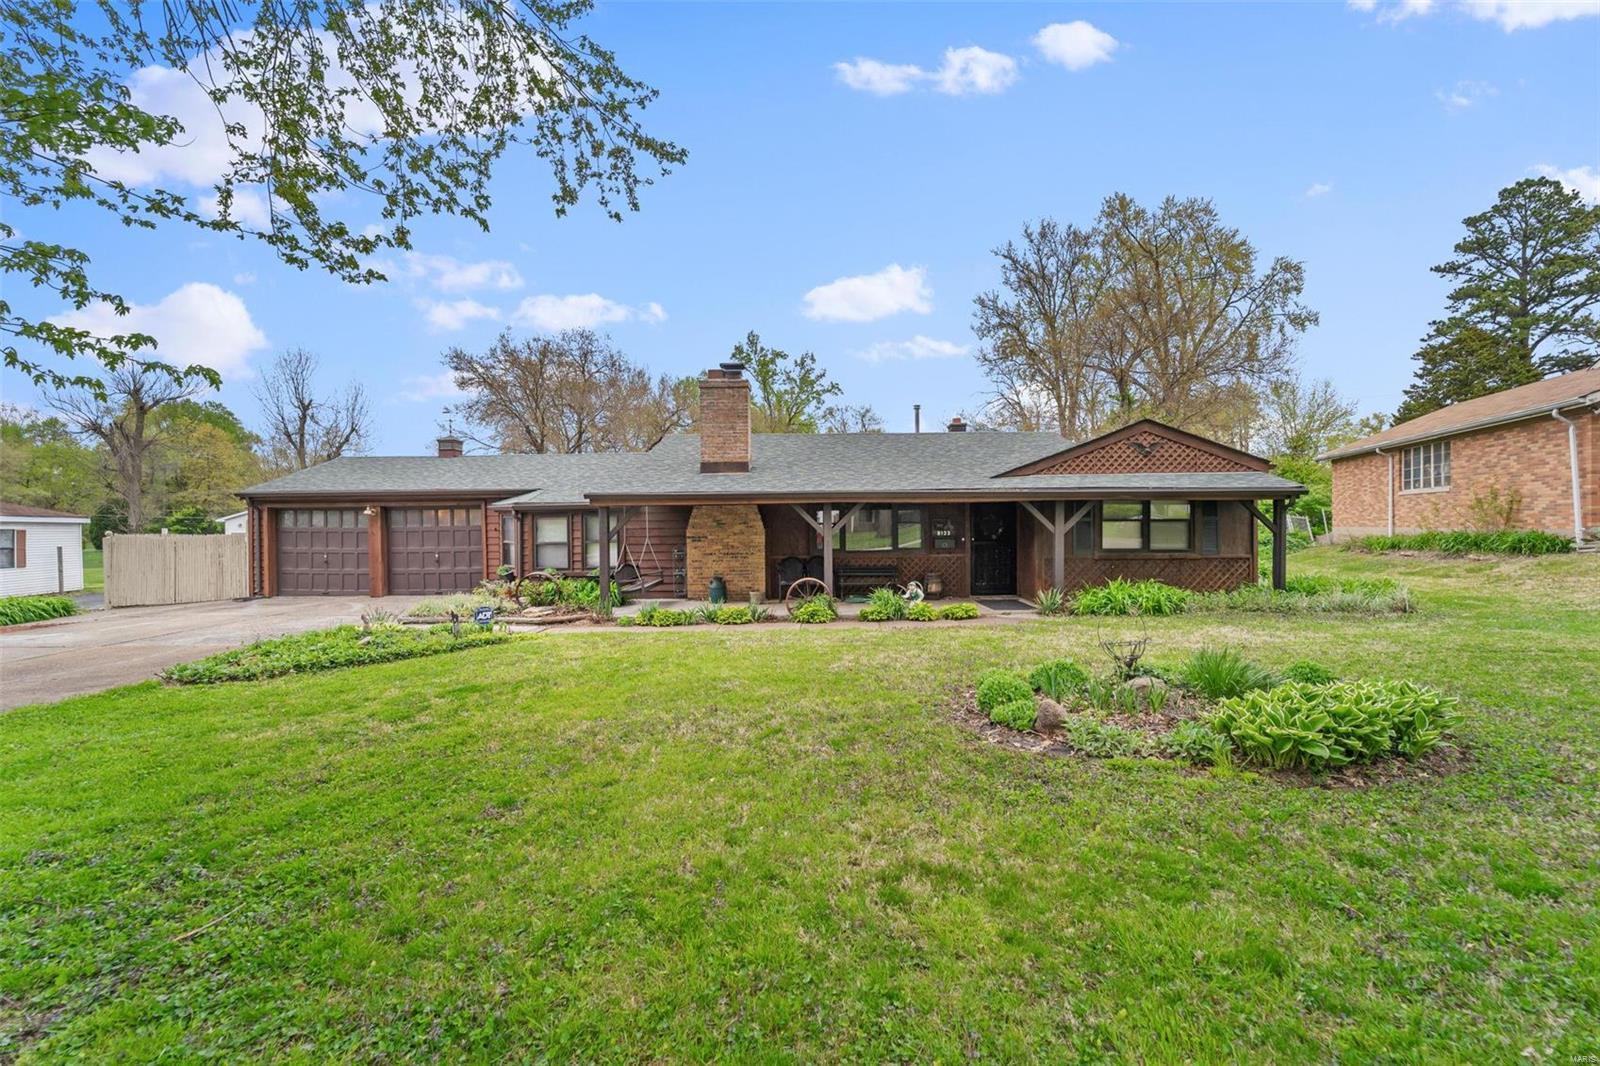 8133 Gardner Ln Property Photo - Berkeley, MO real estate listing